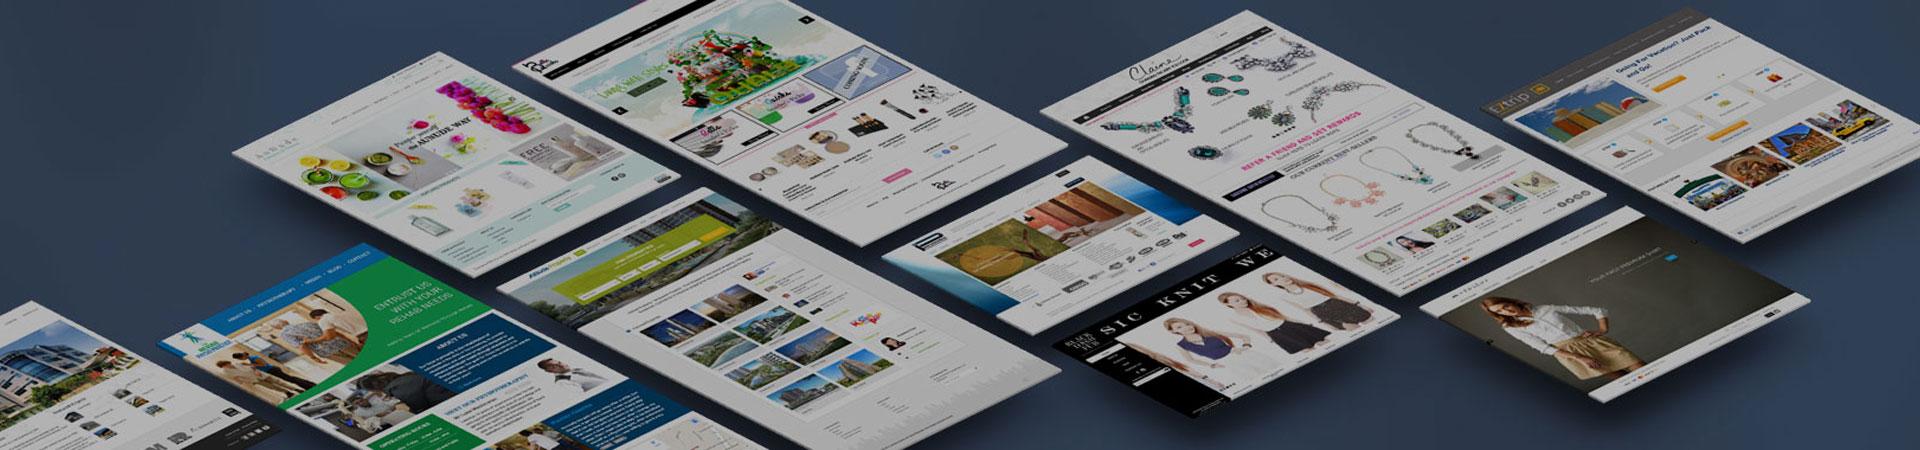 Website Design Singapore - Thread Theory